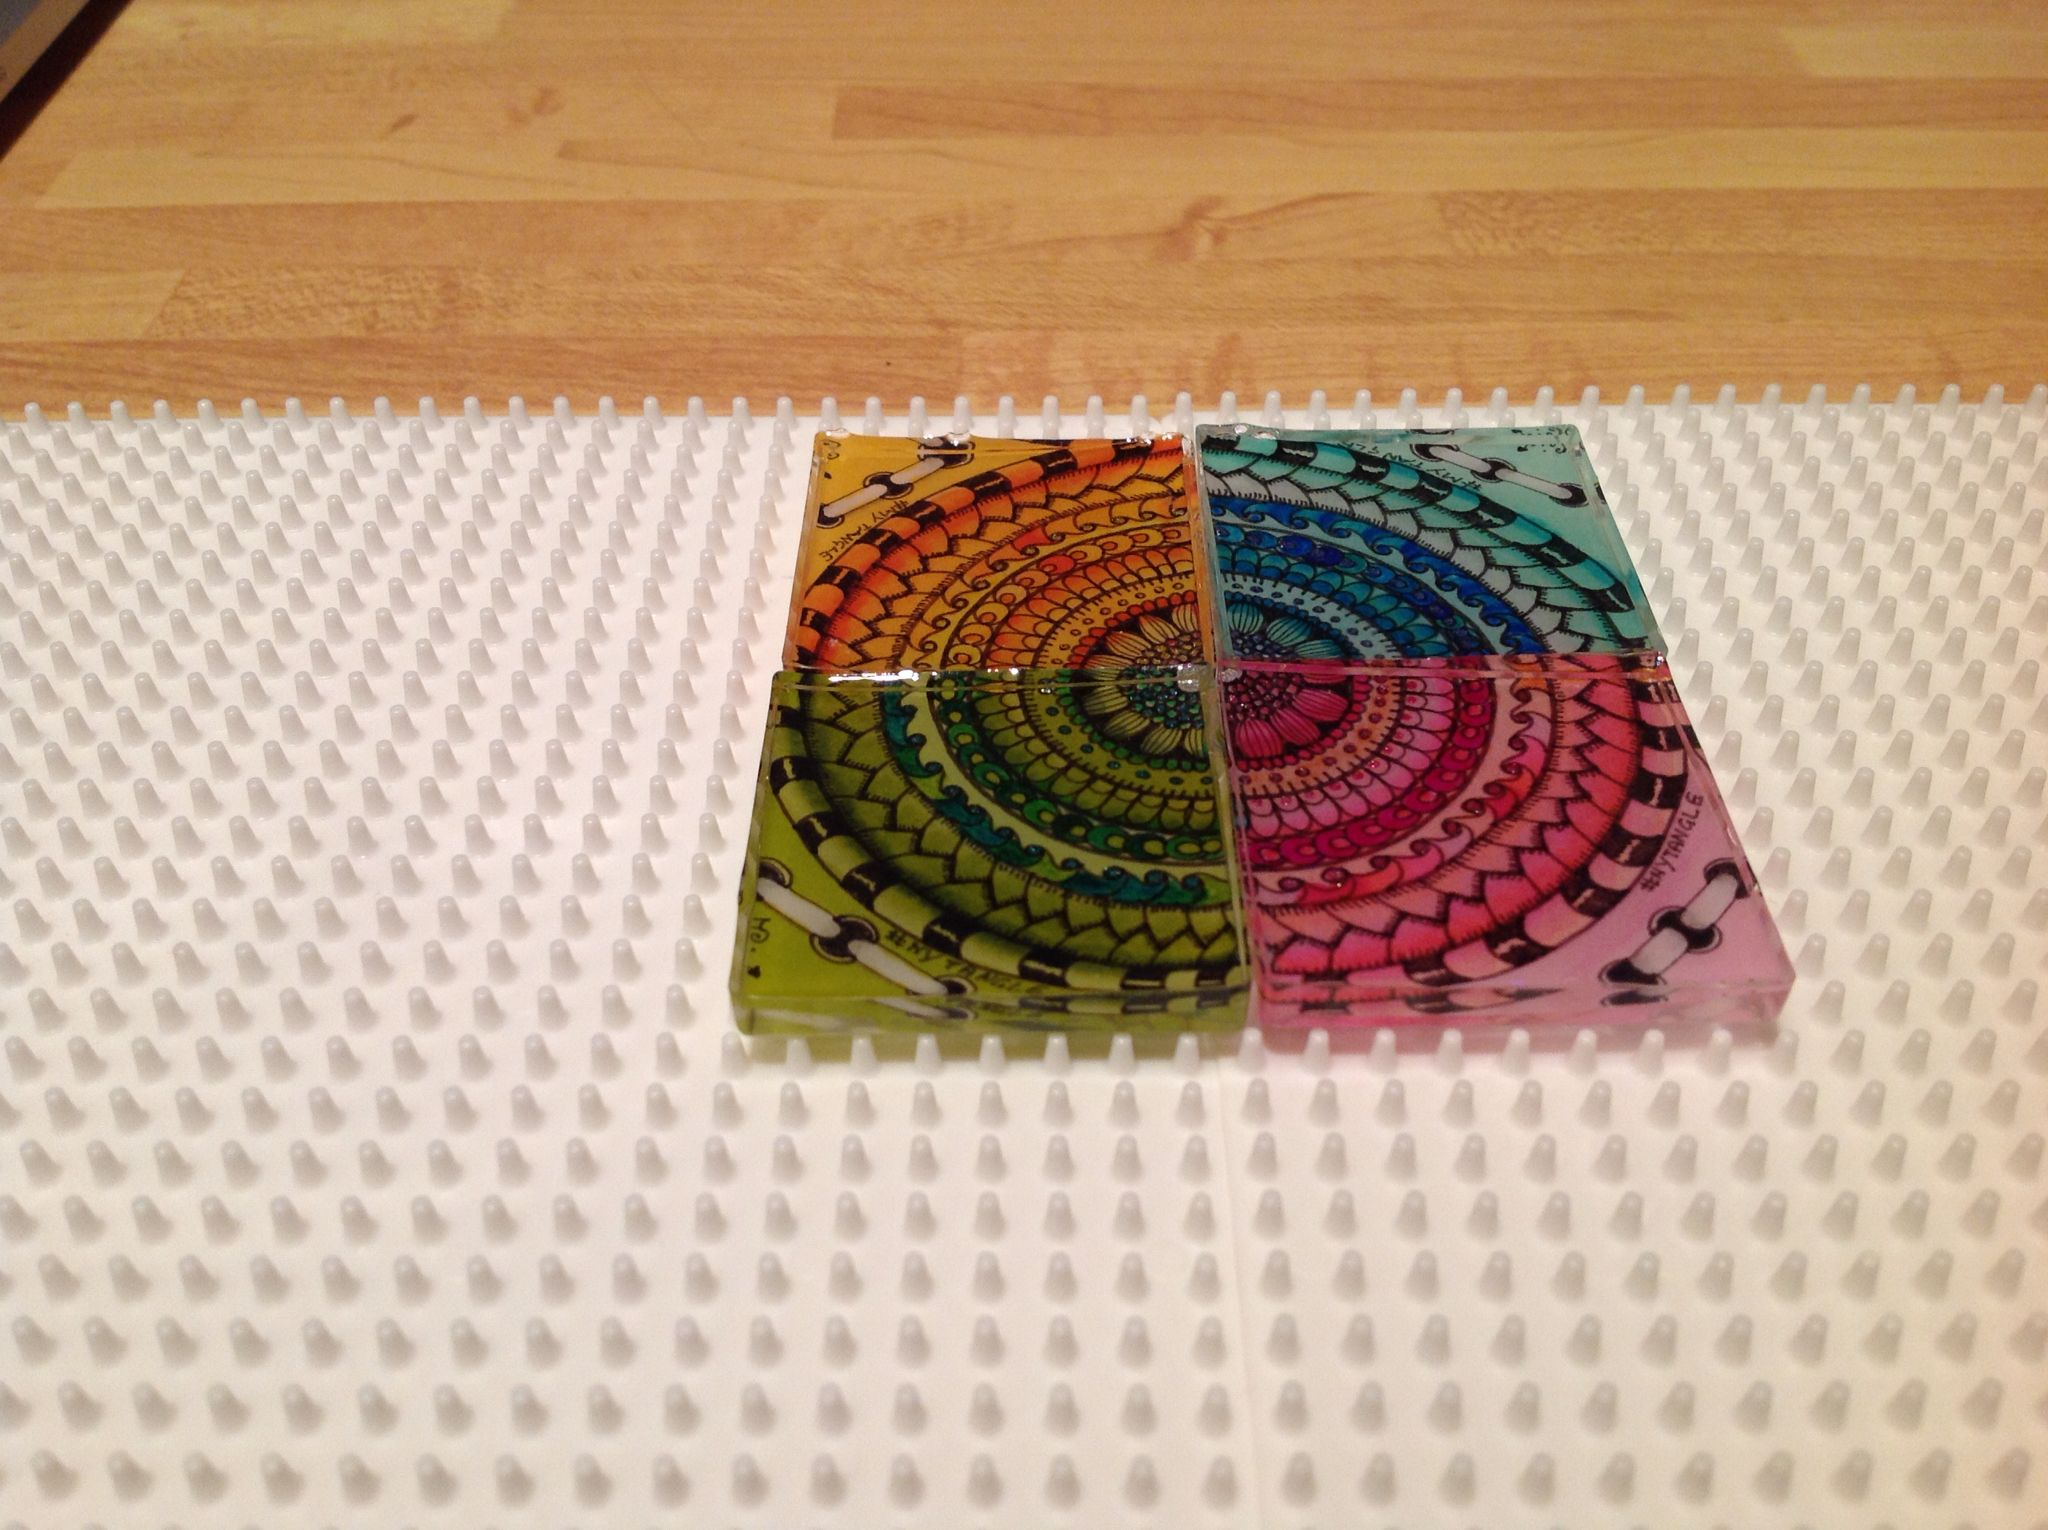 4Expression MyTangle - #zentangle #tangle #doodle #myart #resin #handmade